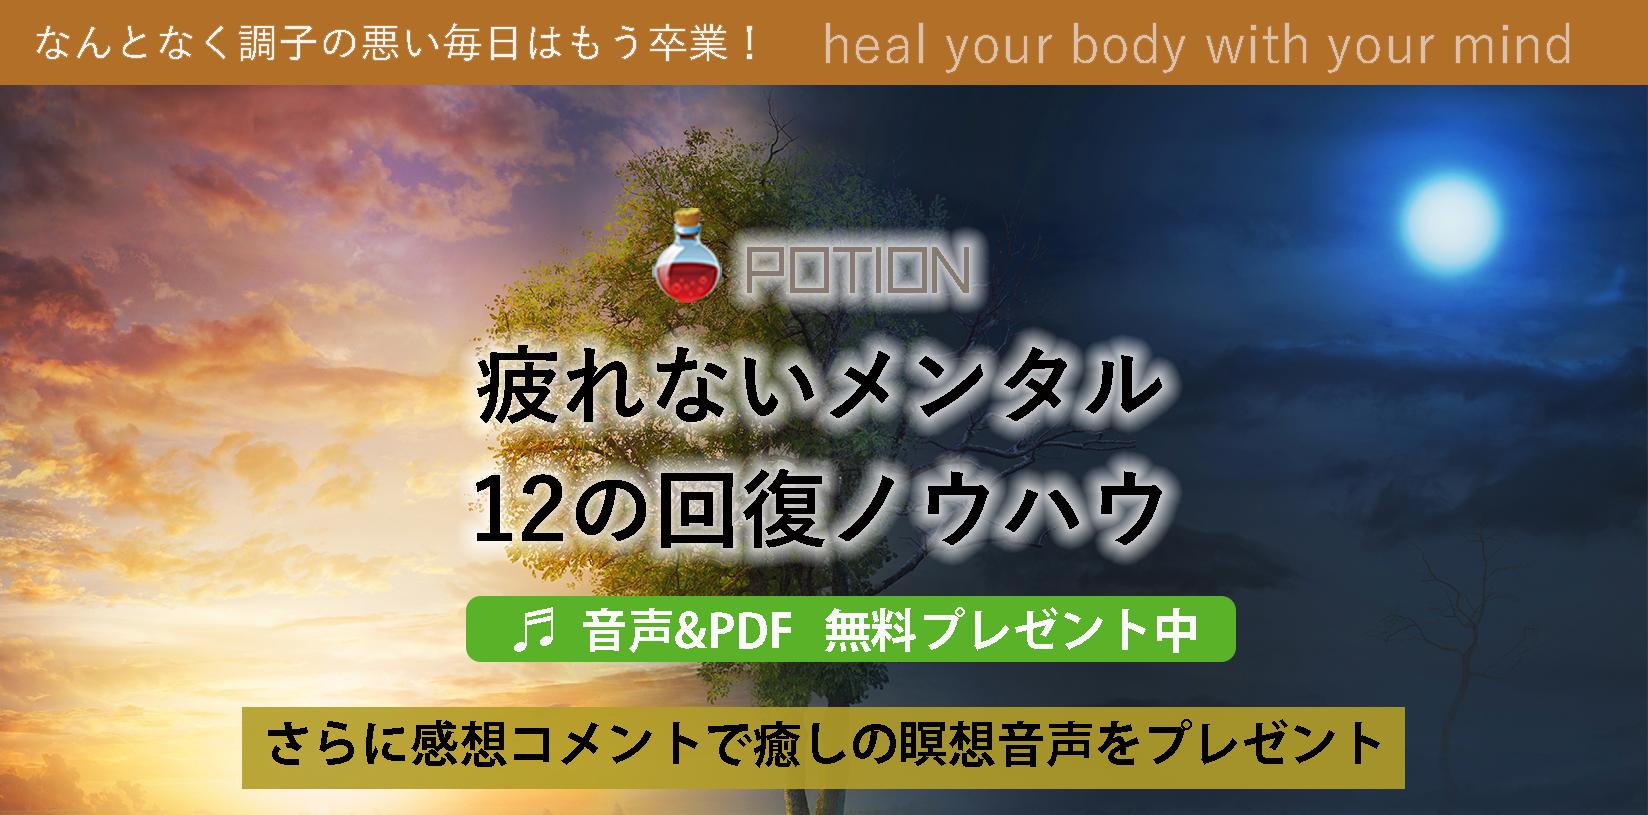 PC用画像 potion